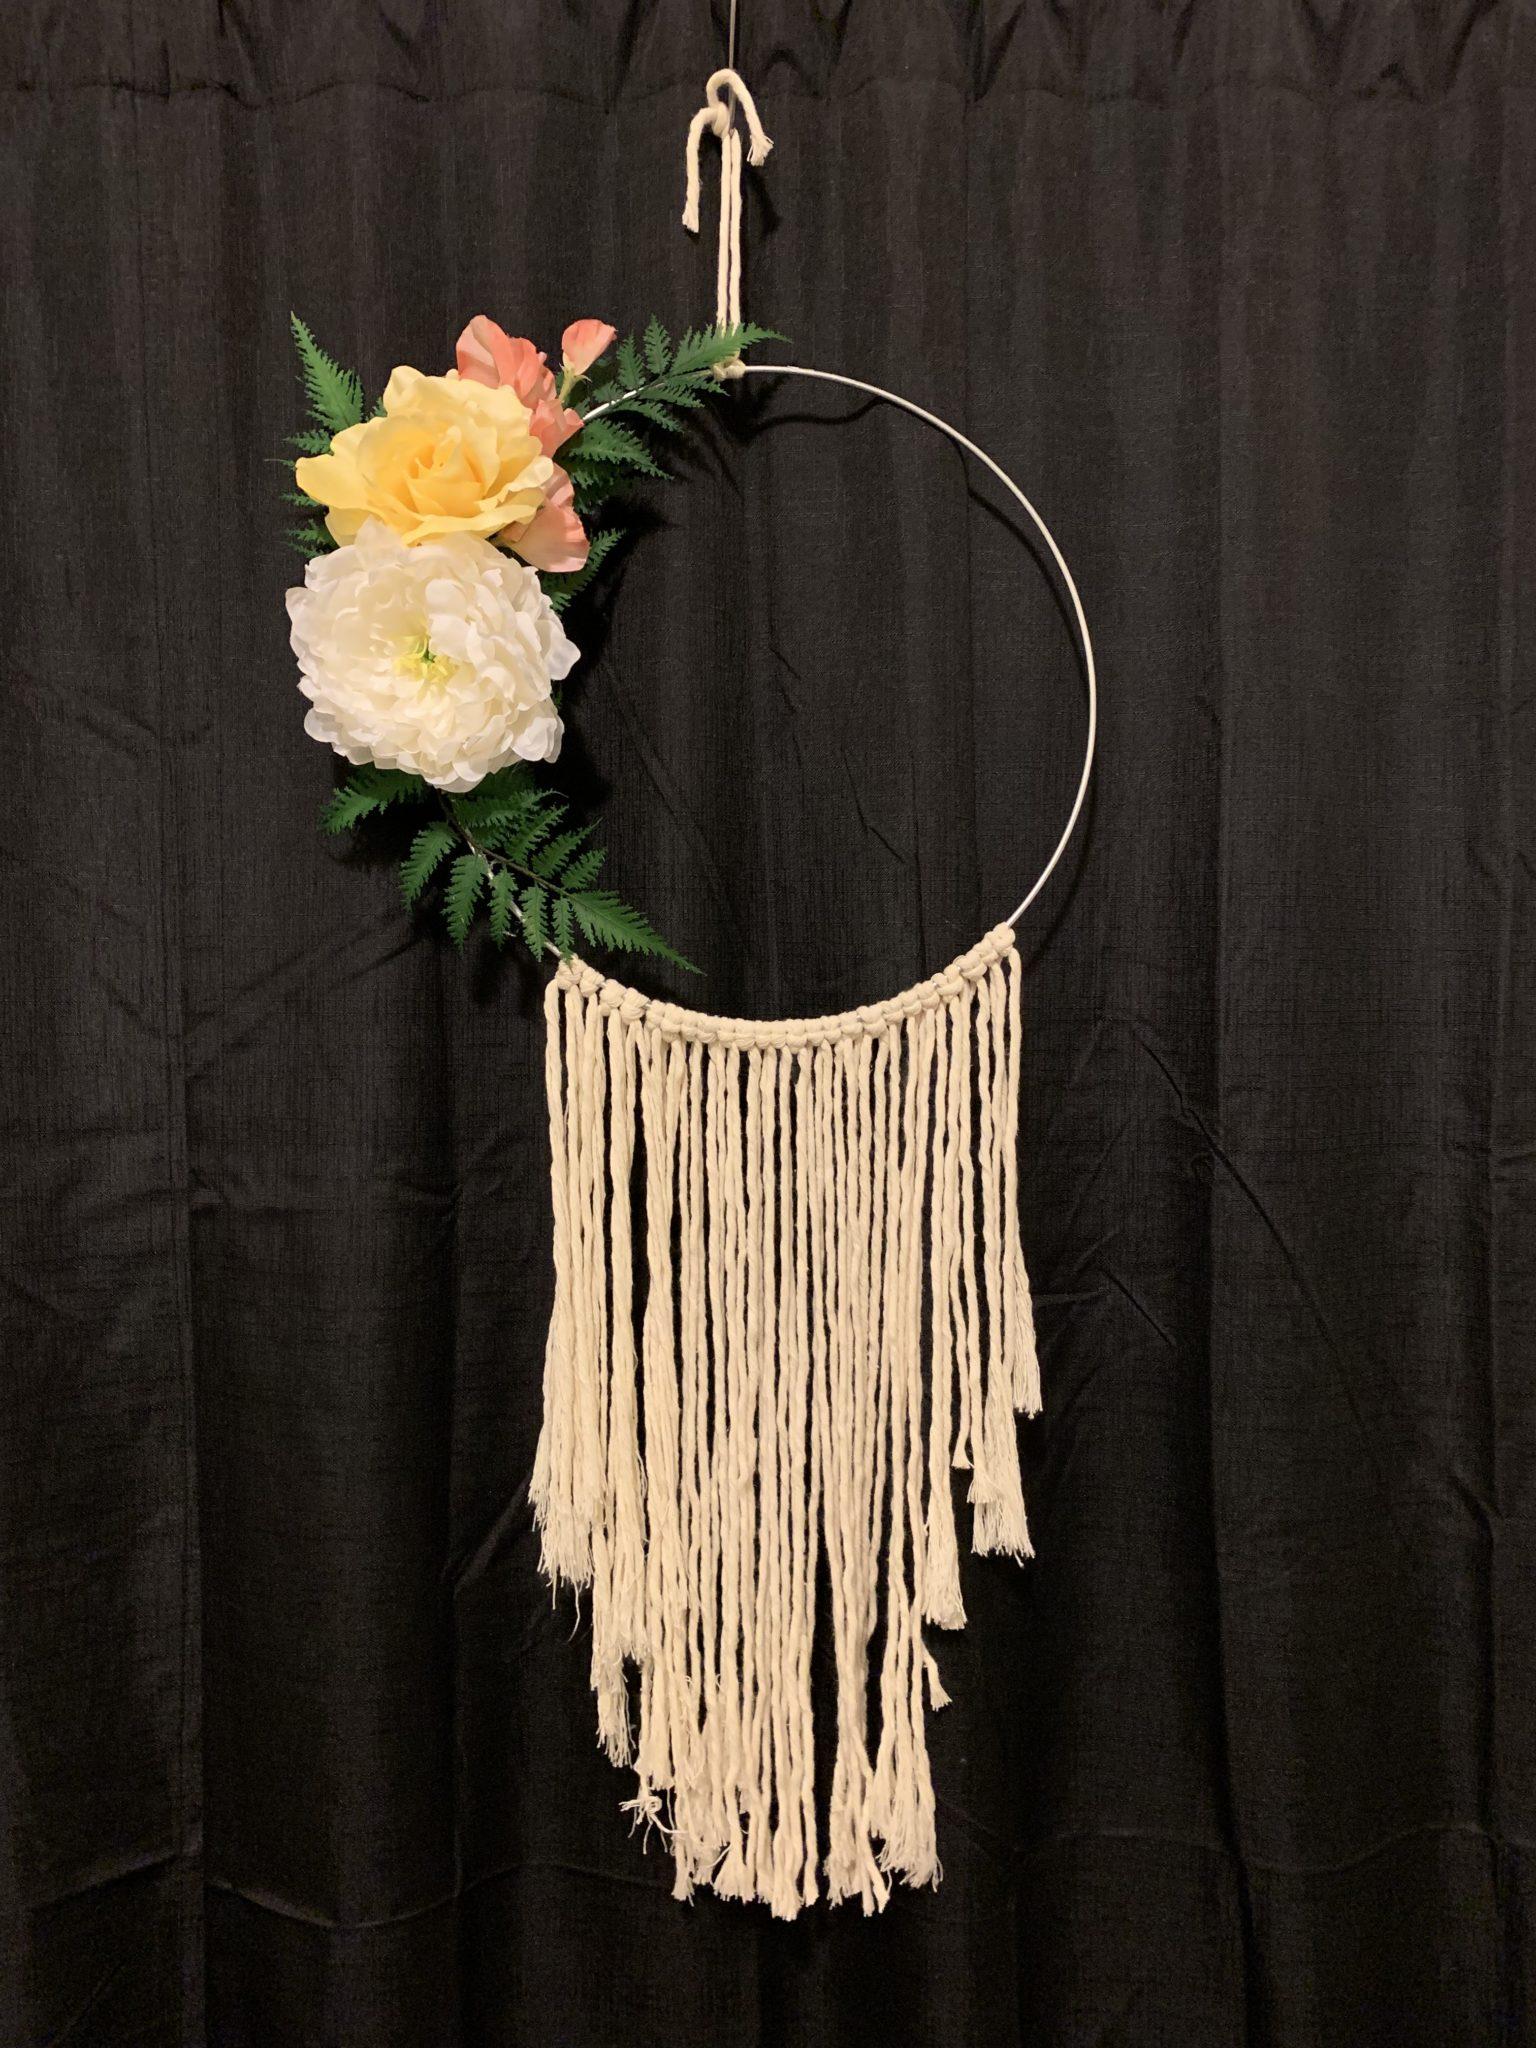 Macrame Floral Wreath